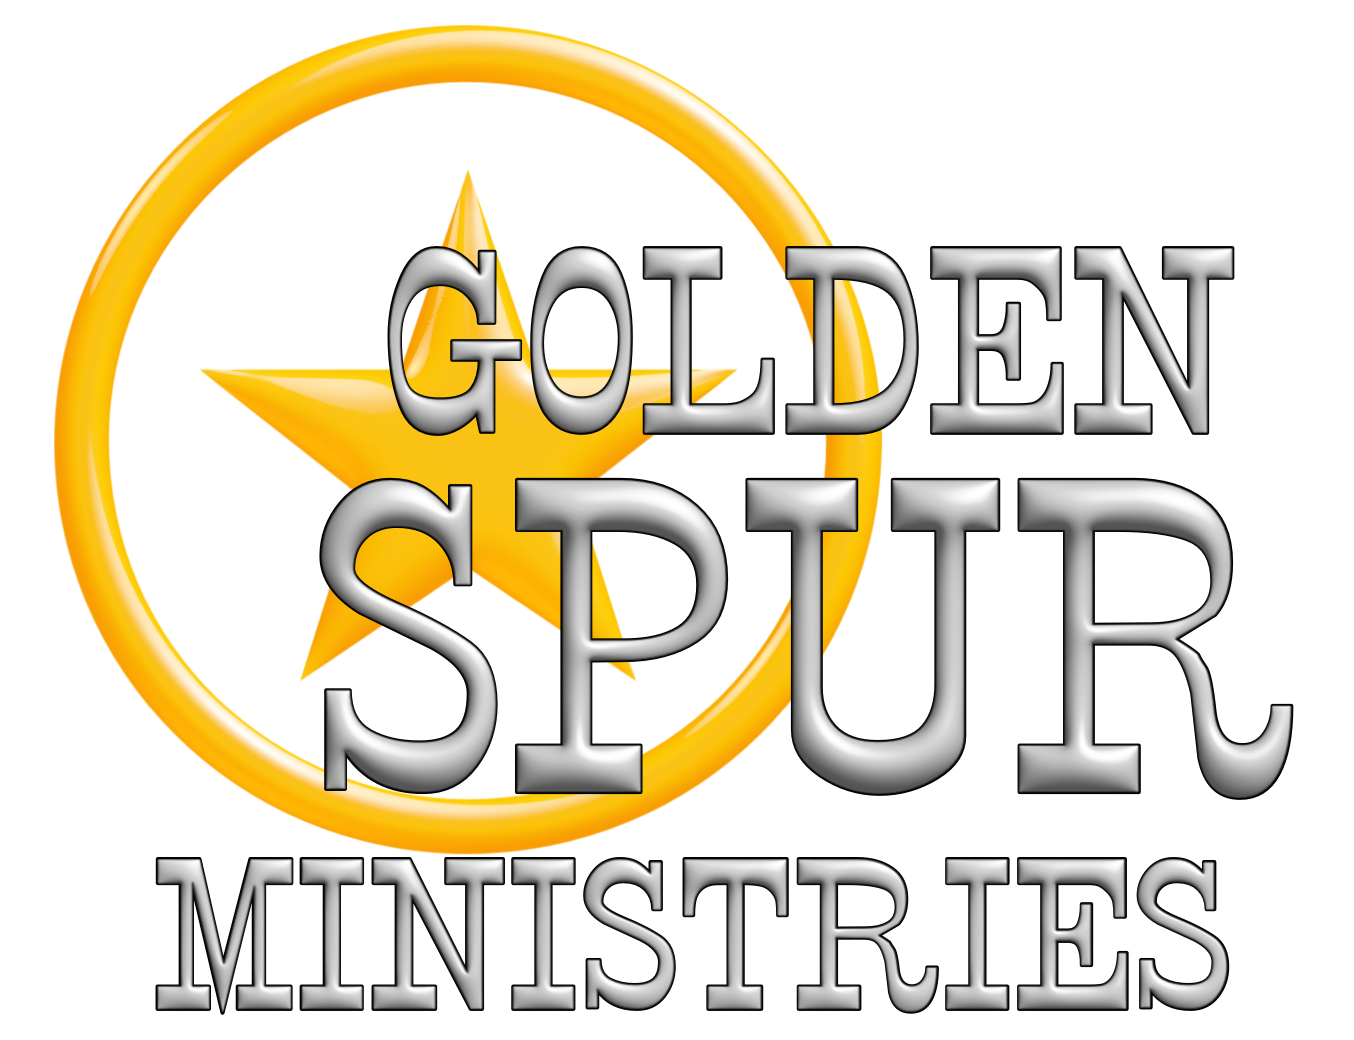 Pastor clipart chaplain. News golden spur ministries